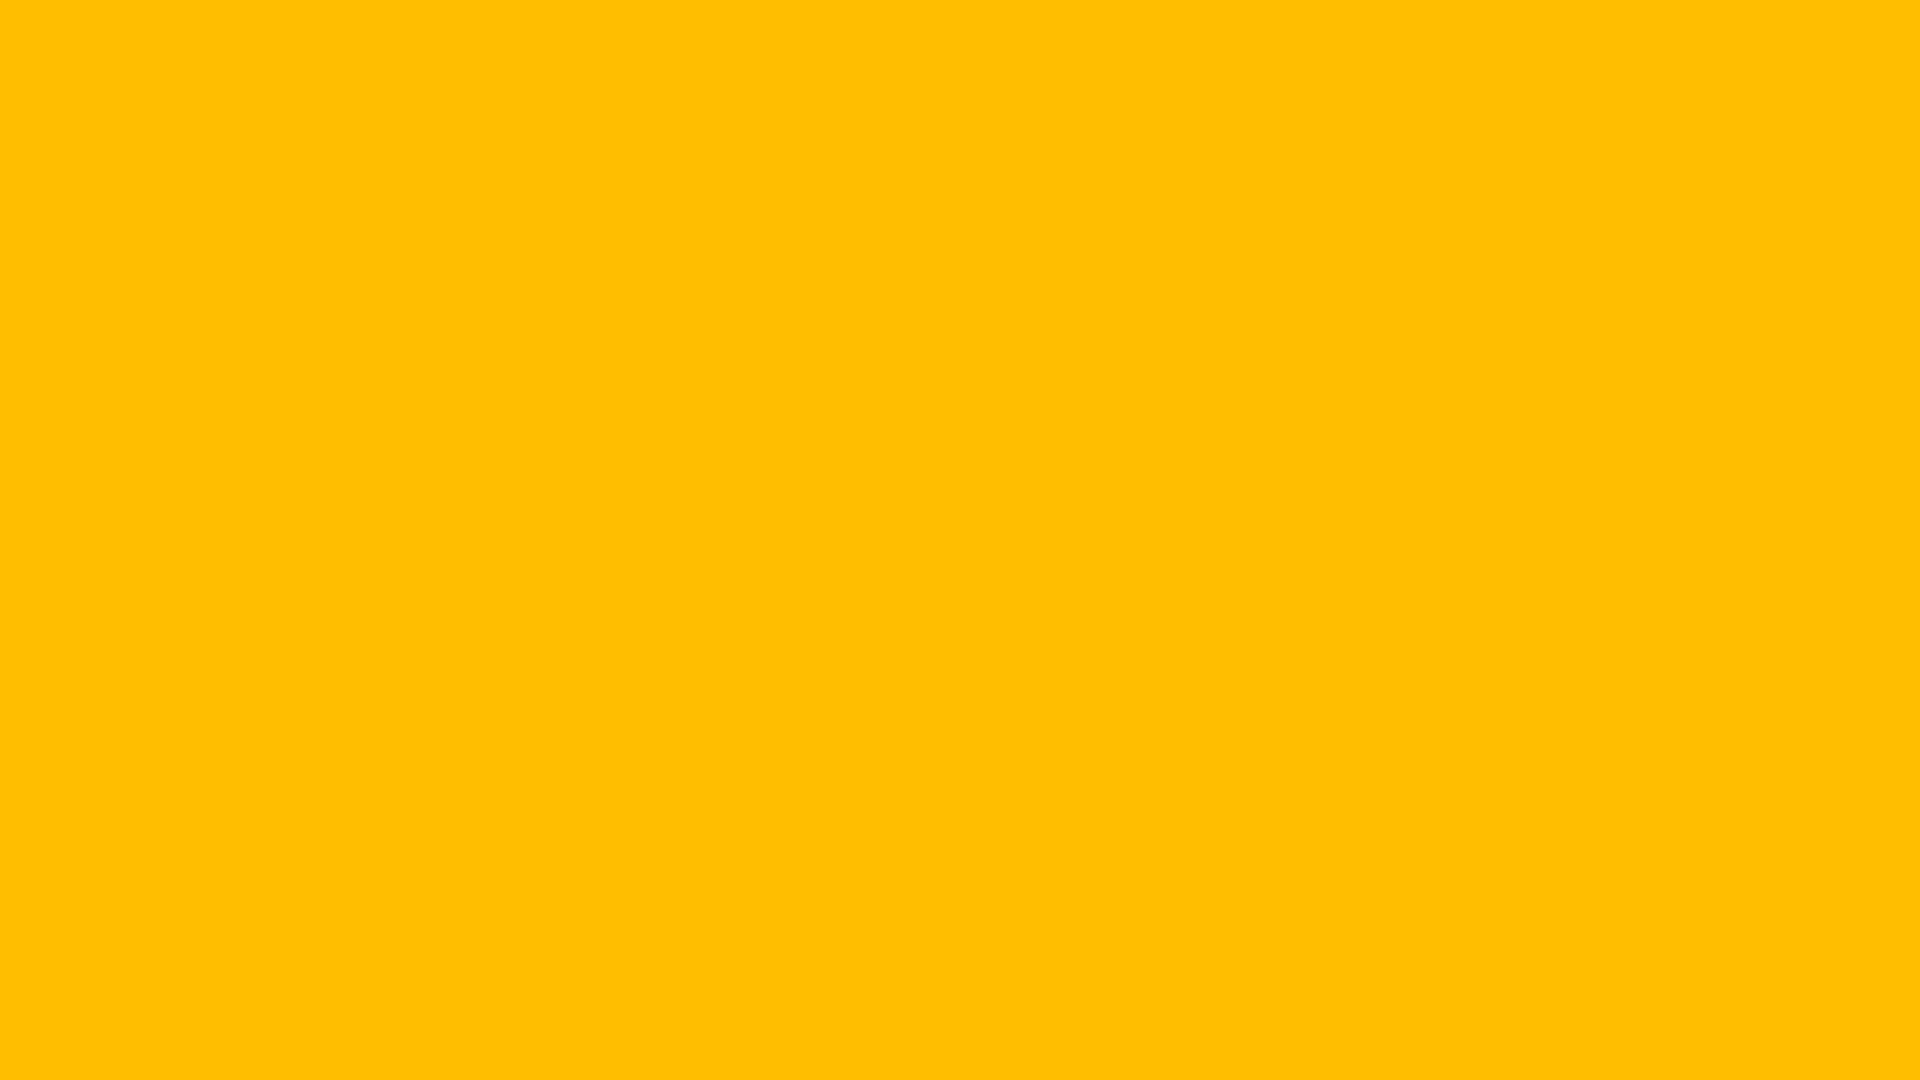 1920x1080 Fluorescent Orange Solid Color Background